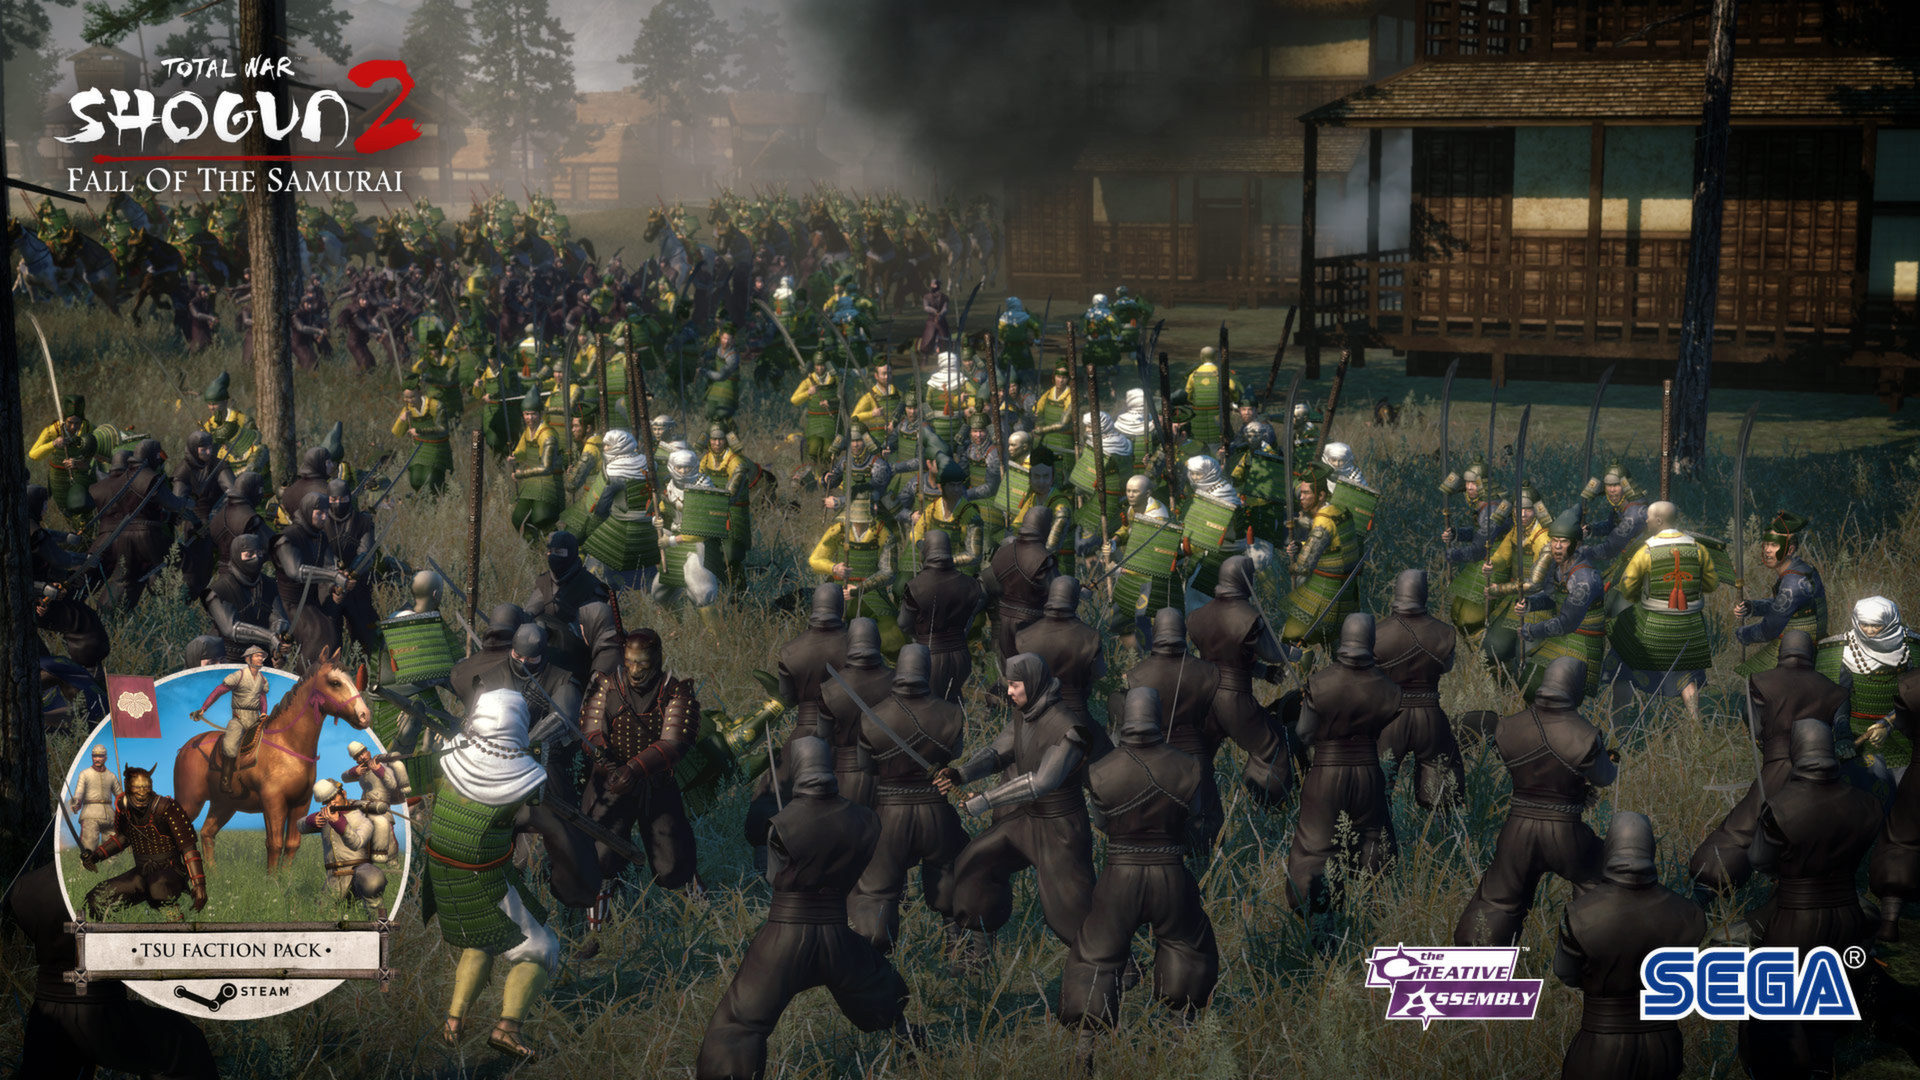 download shogun 2 total war torrent